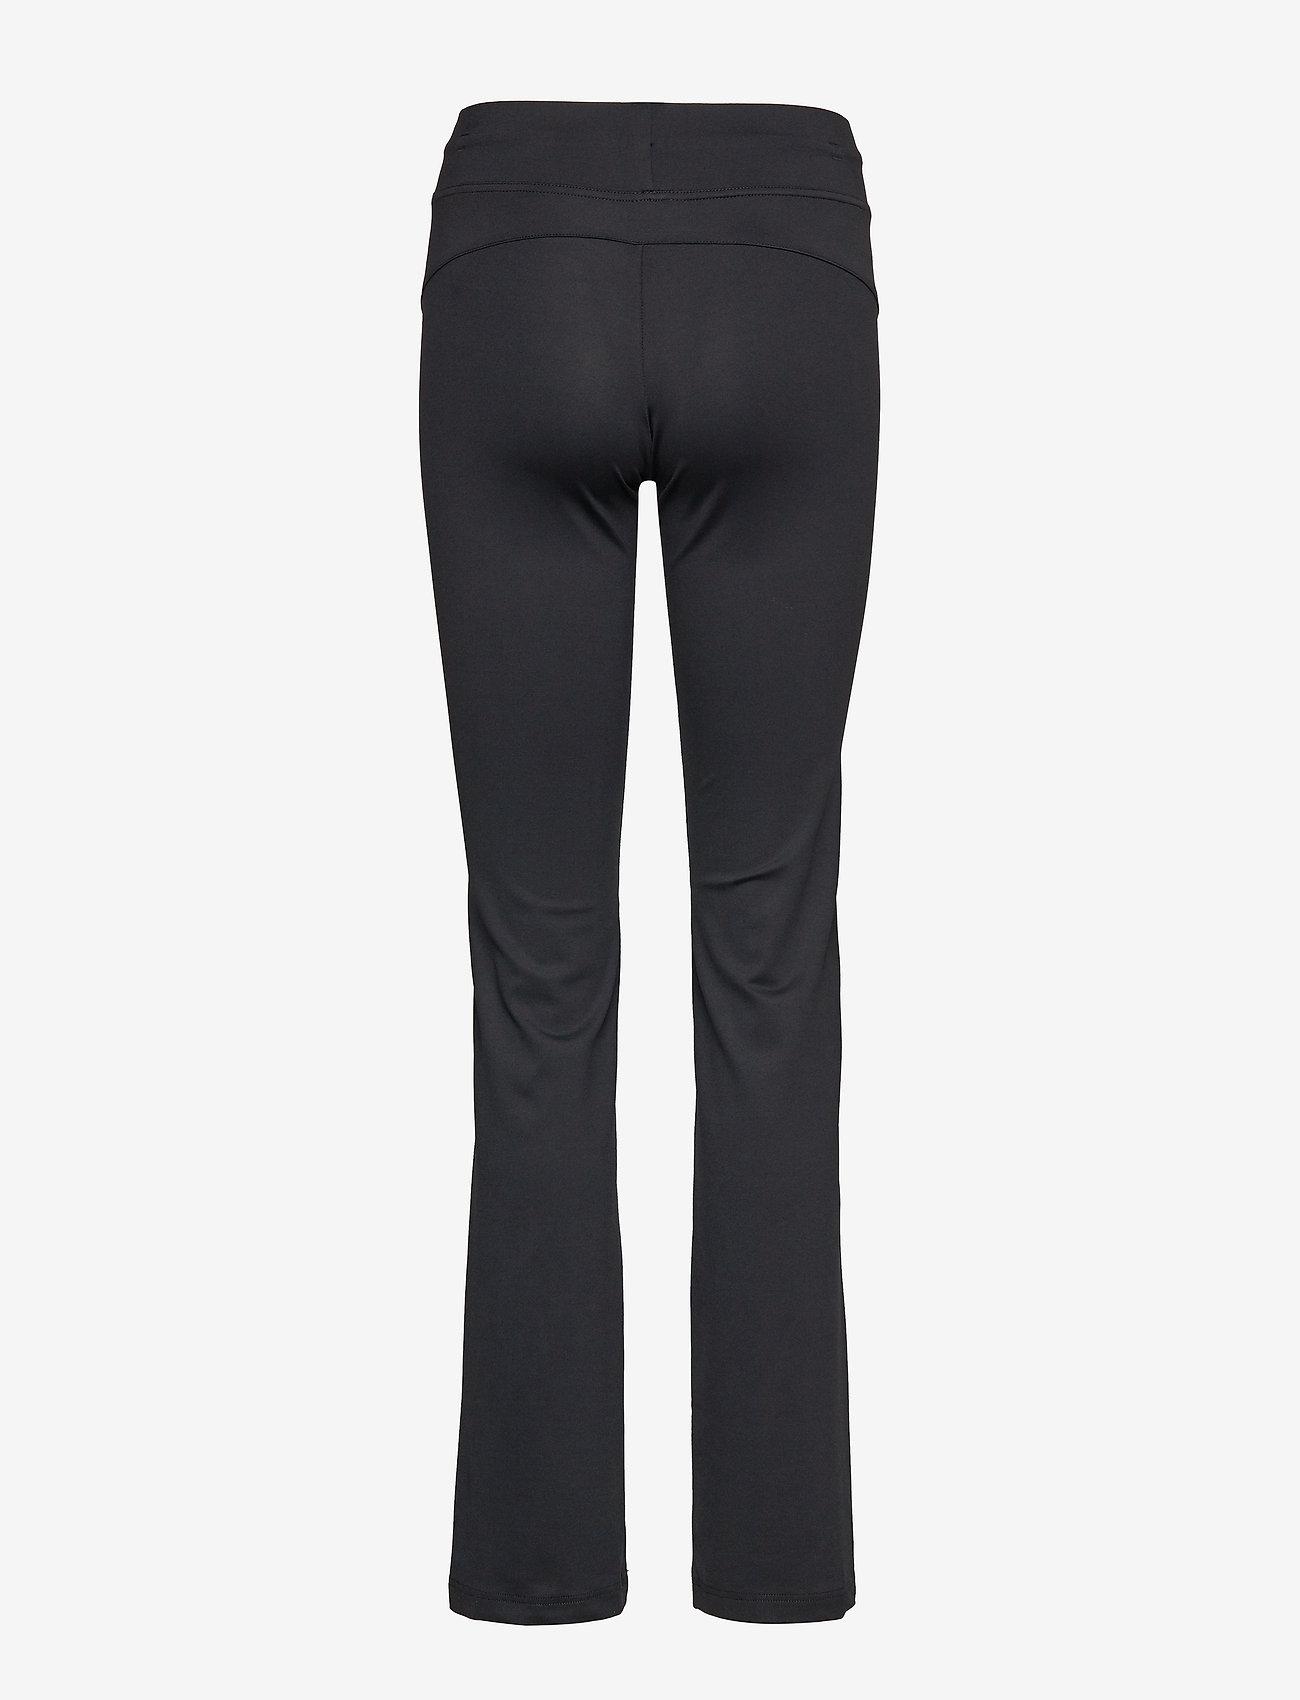 Casall - Essential training pants - treniņu bikses - black - 1